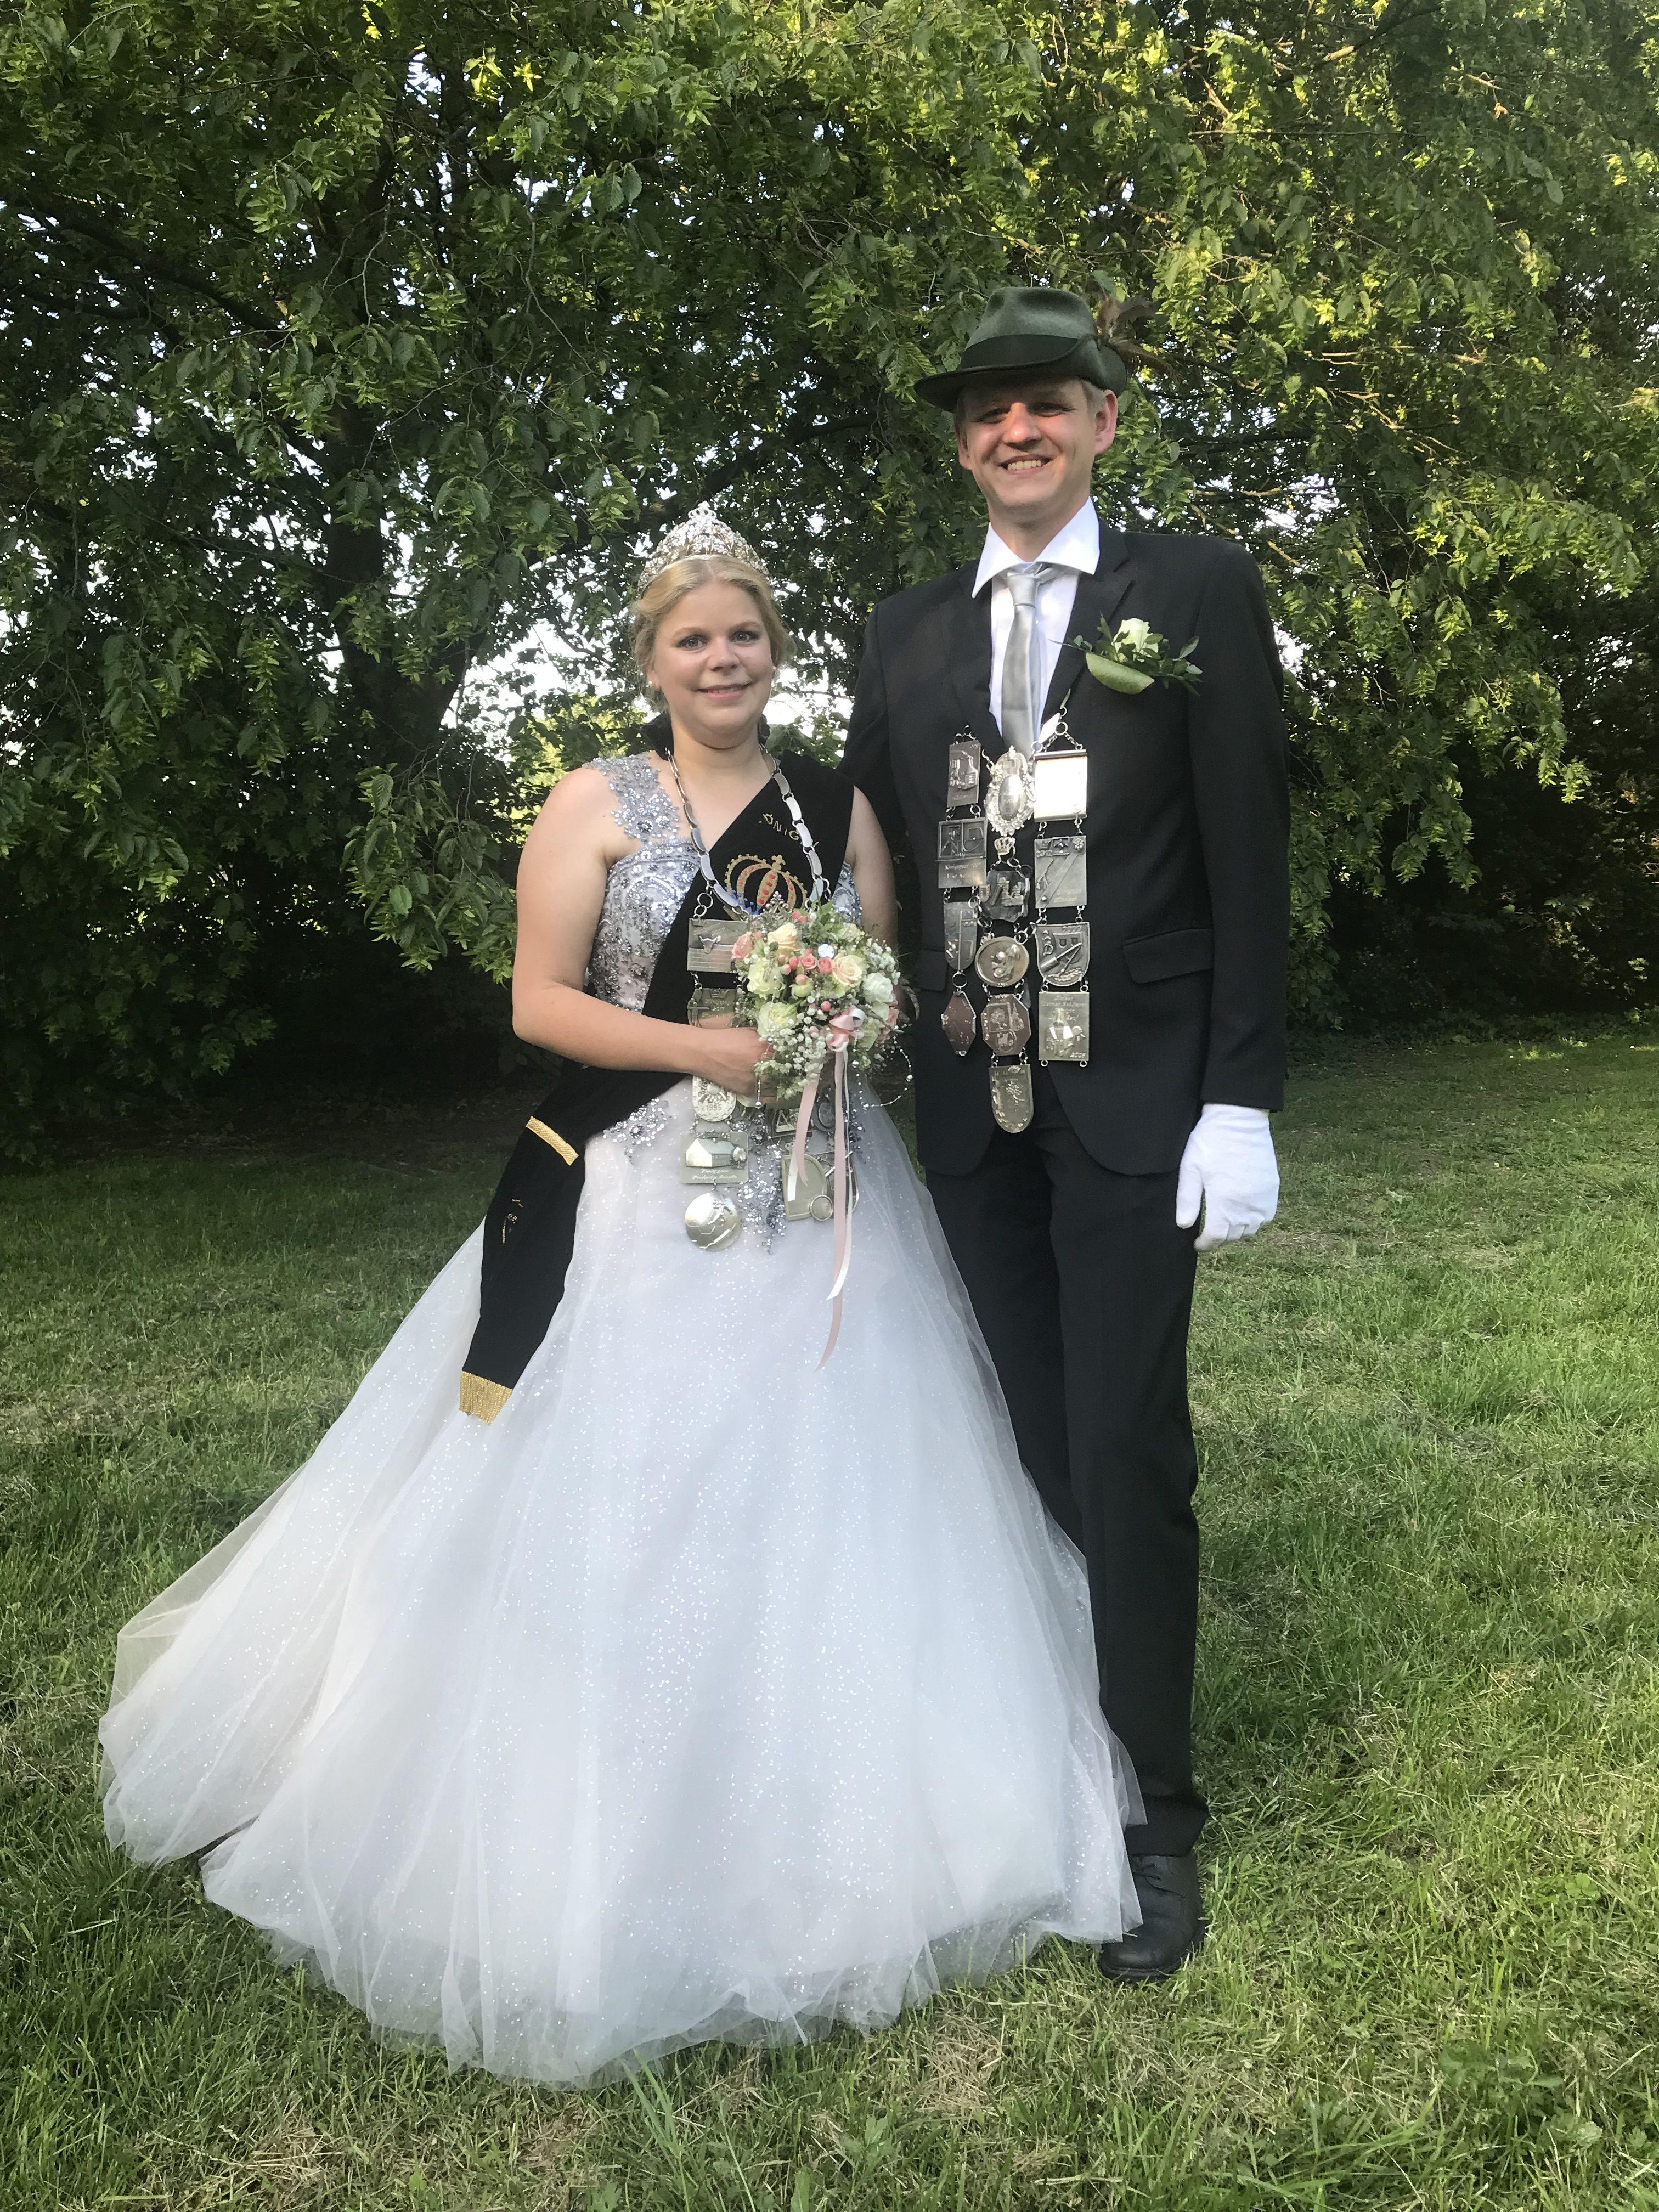 Königspaar 2019